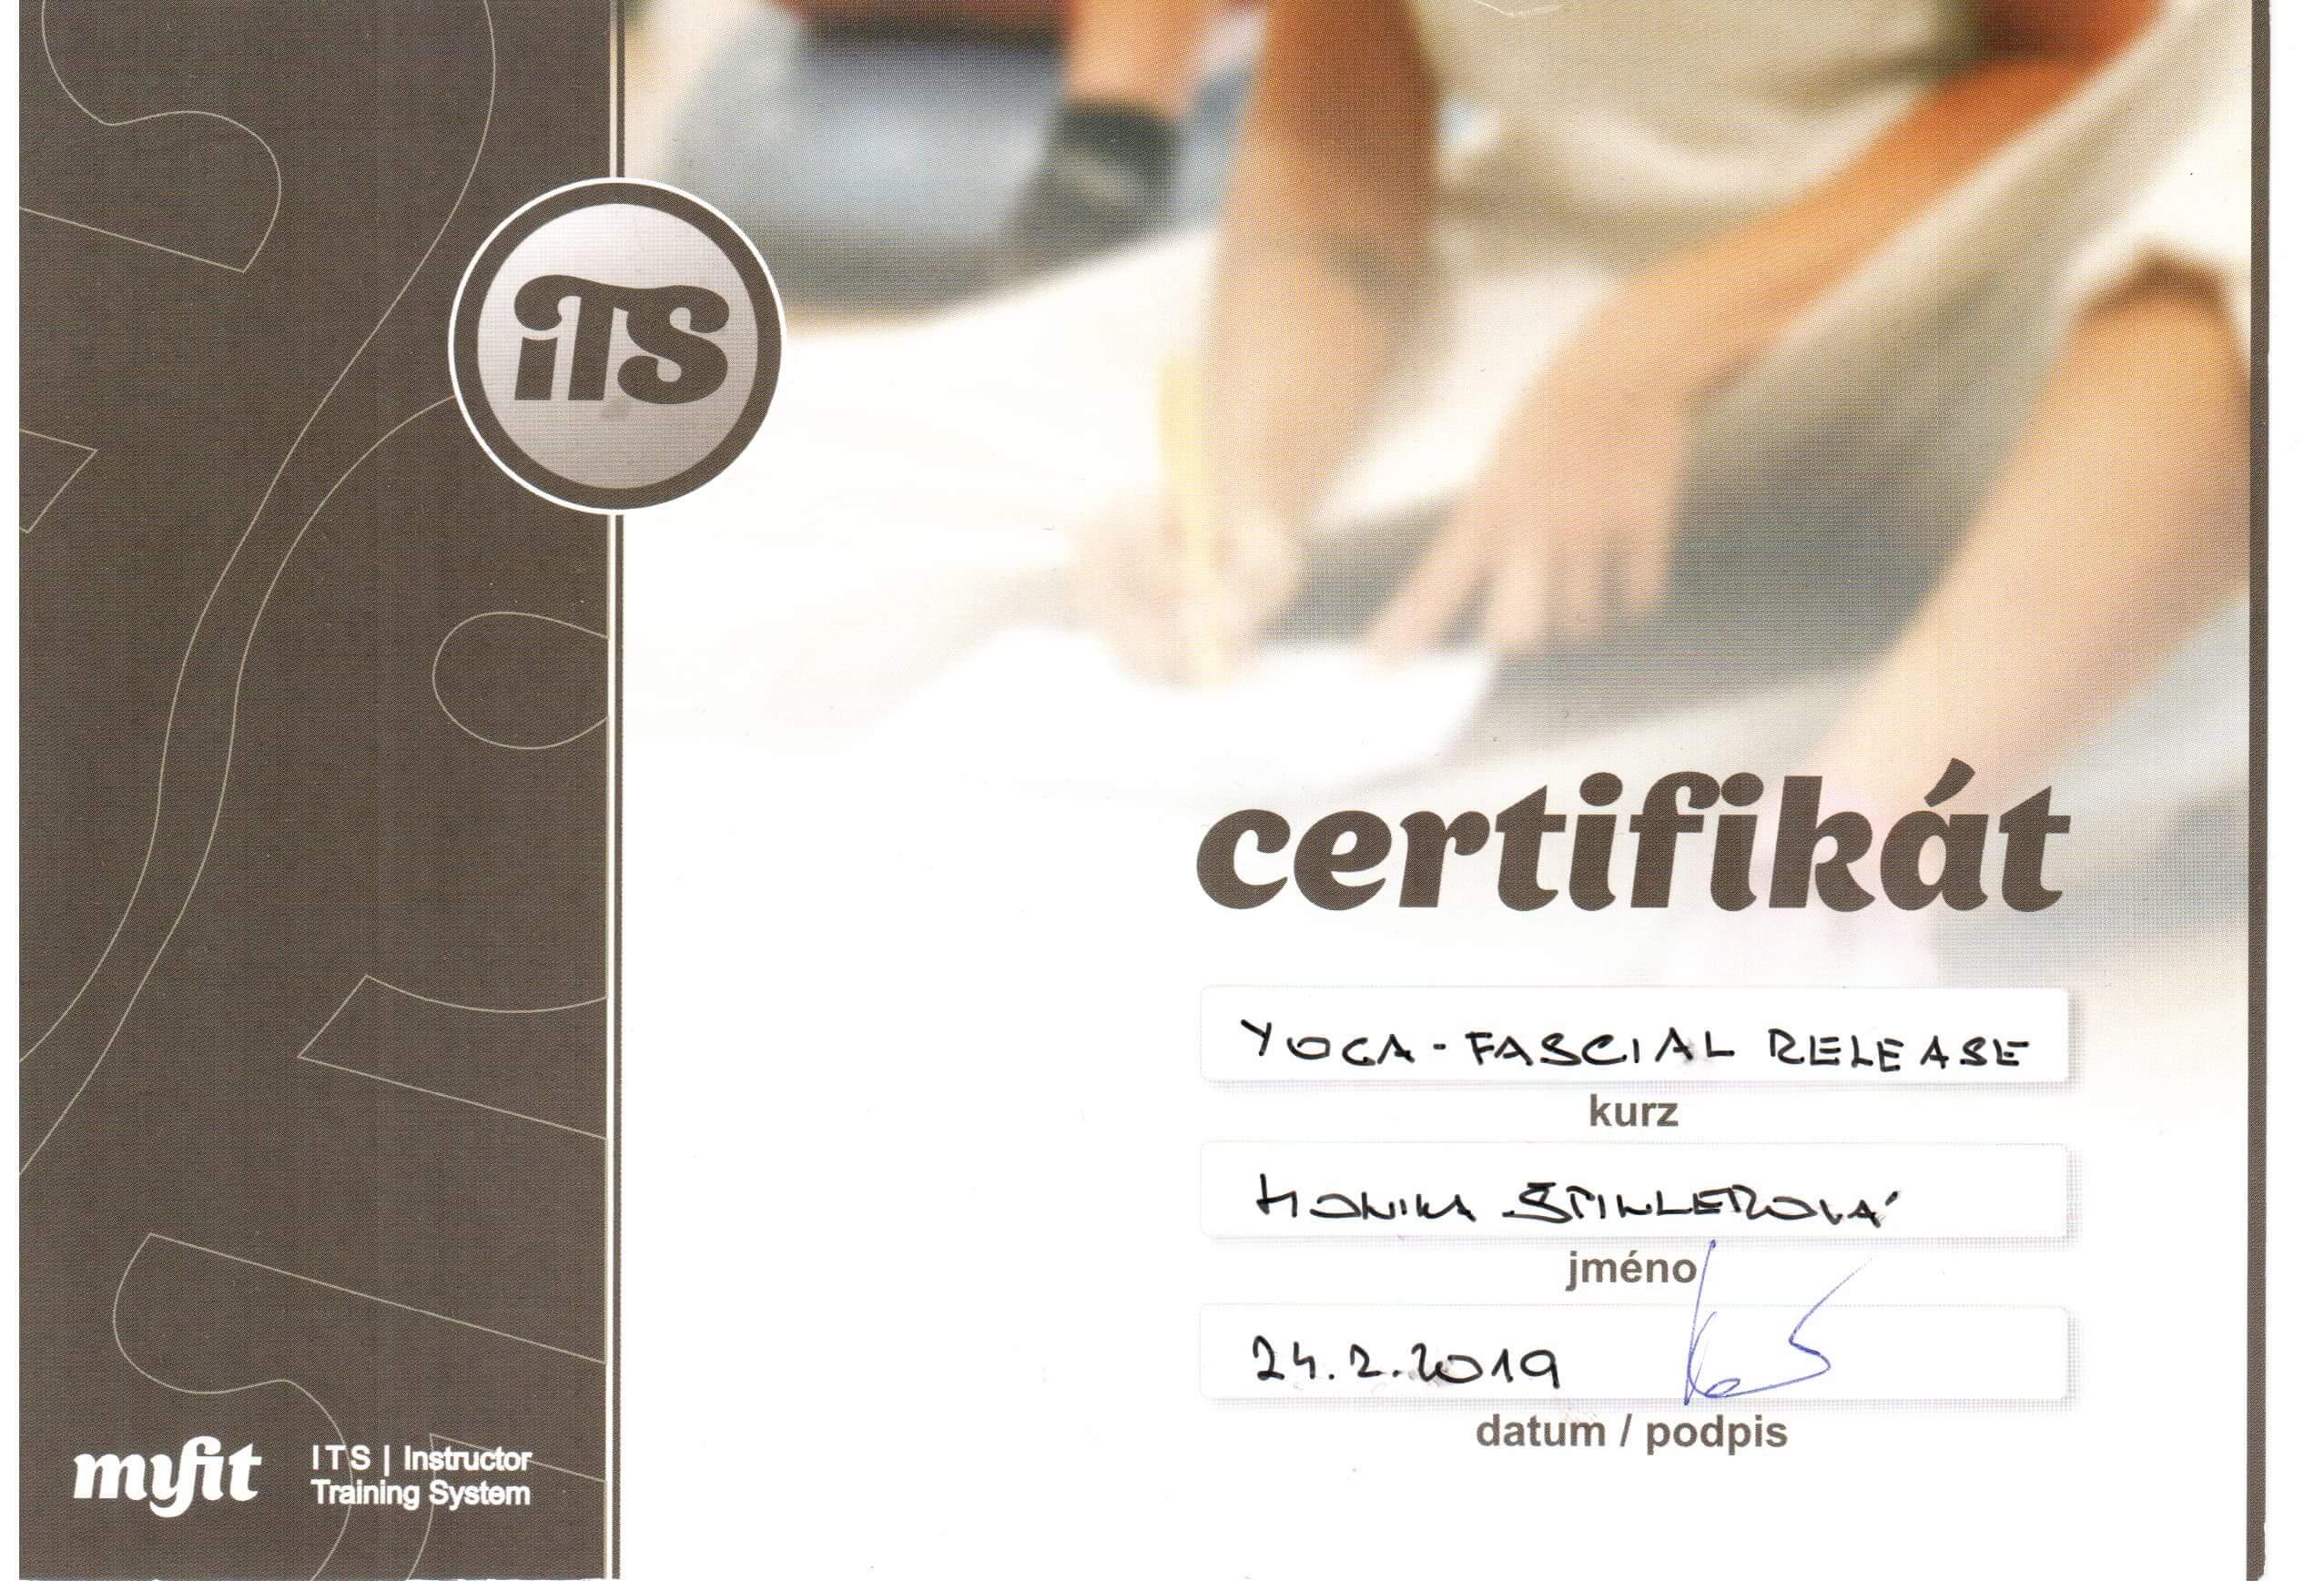 Yoga Fascial Release